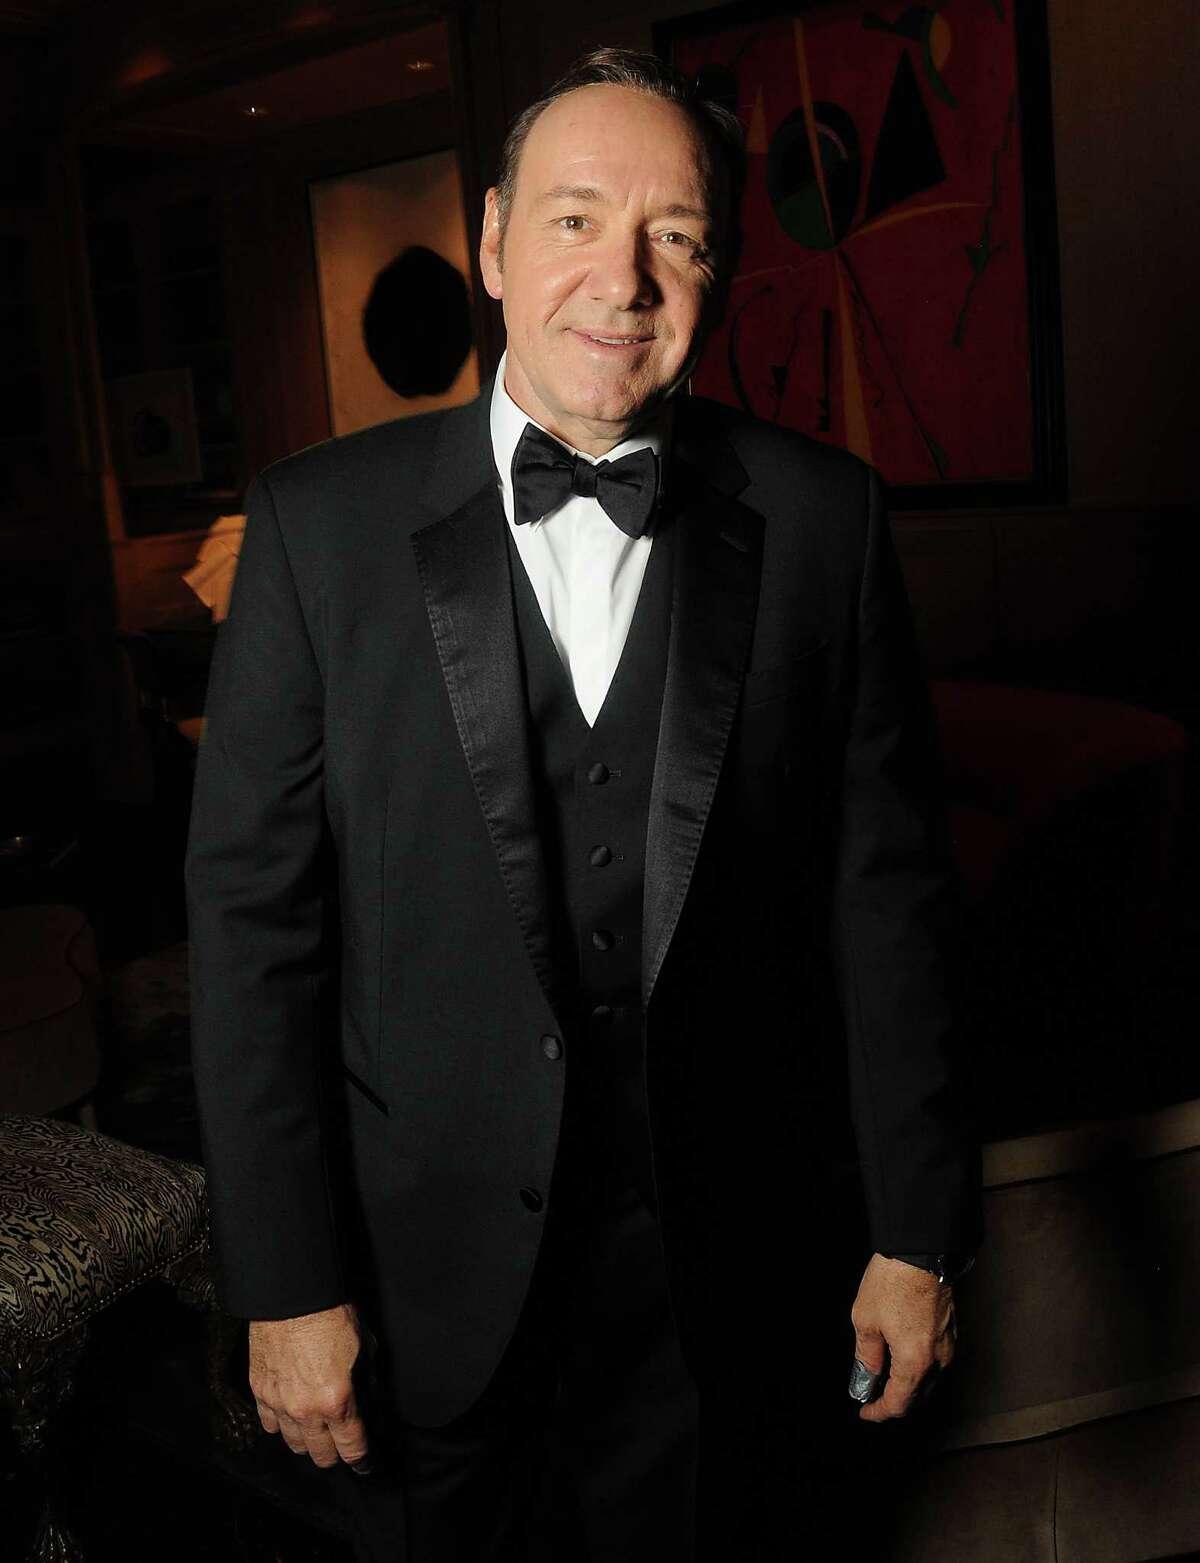 Academy Award winner Kevin Spacey at a Best Buddies benefit.